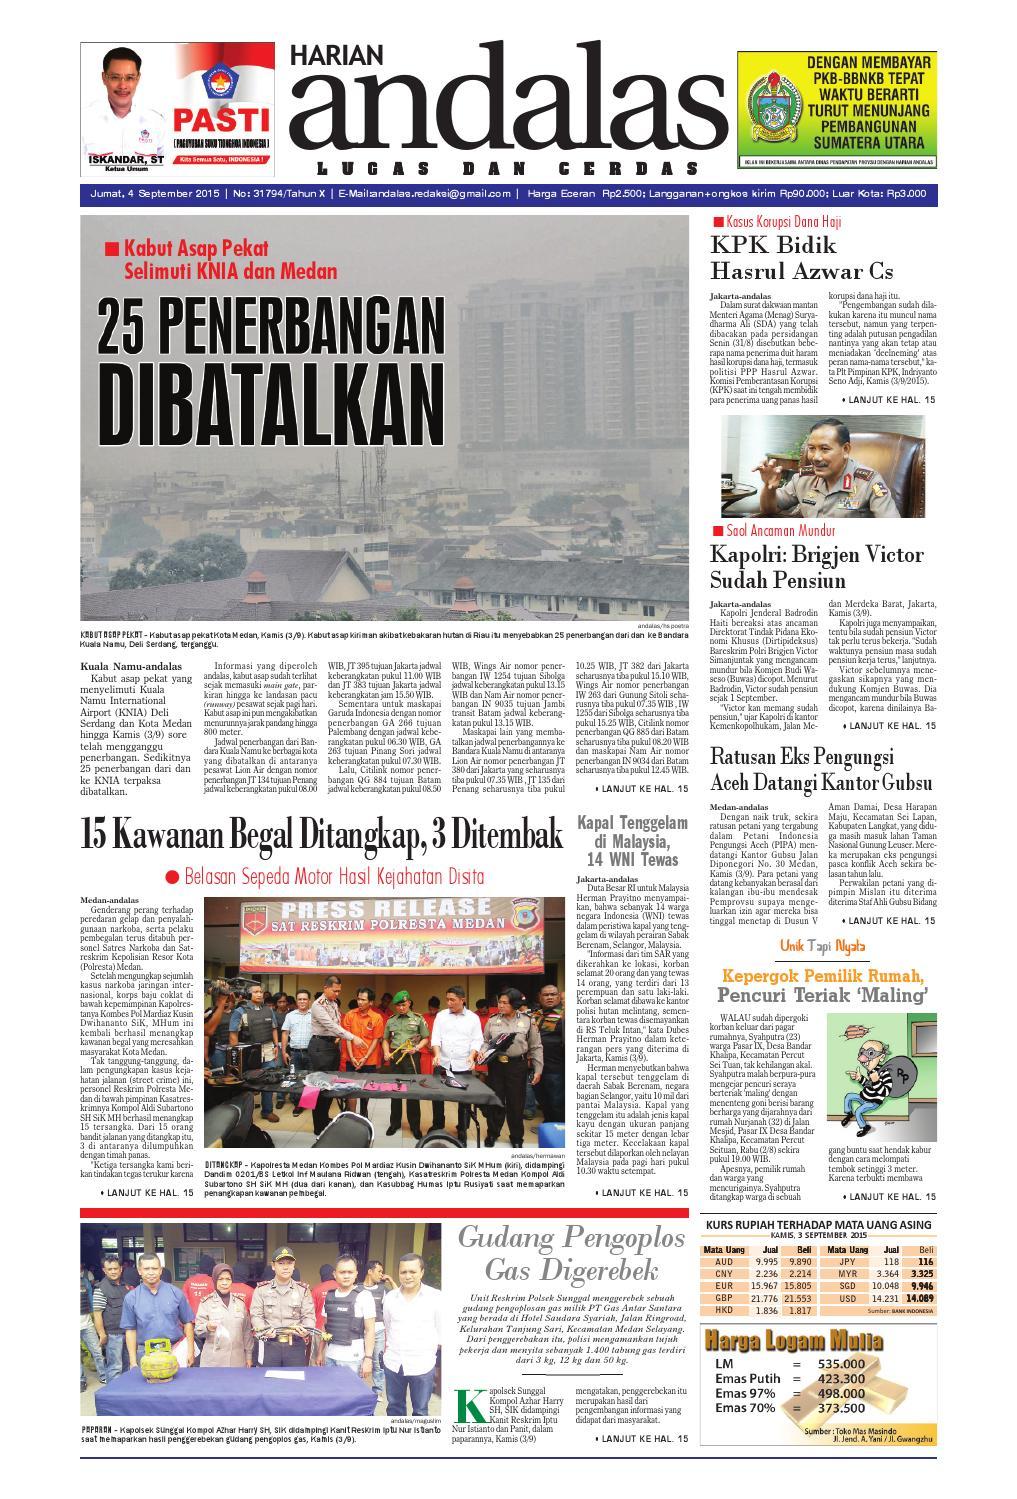 Epaper Andalas Edisi Jumat 4 September 2015 By Media Issuu Fcenter Meja Belajar Sd Hk 9004 Sh Jawa Tengah